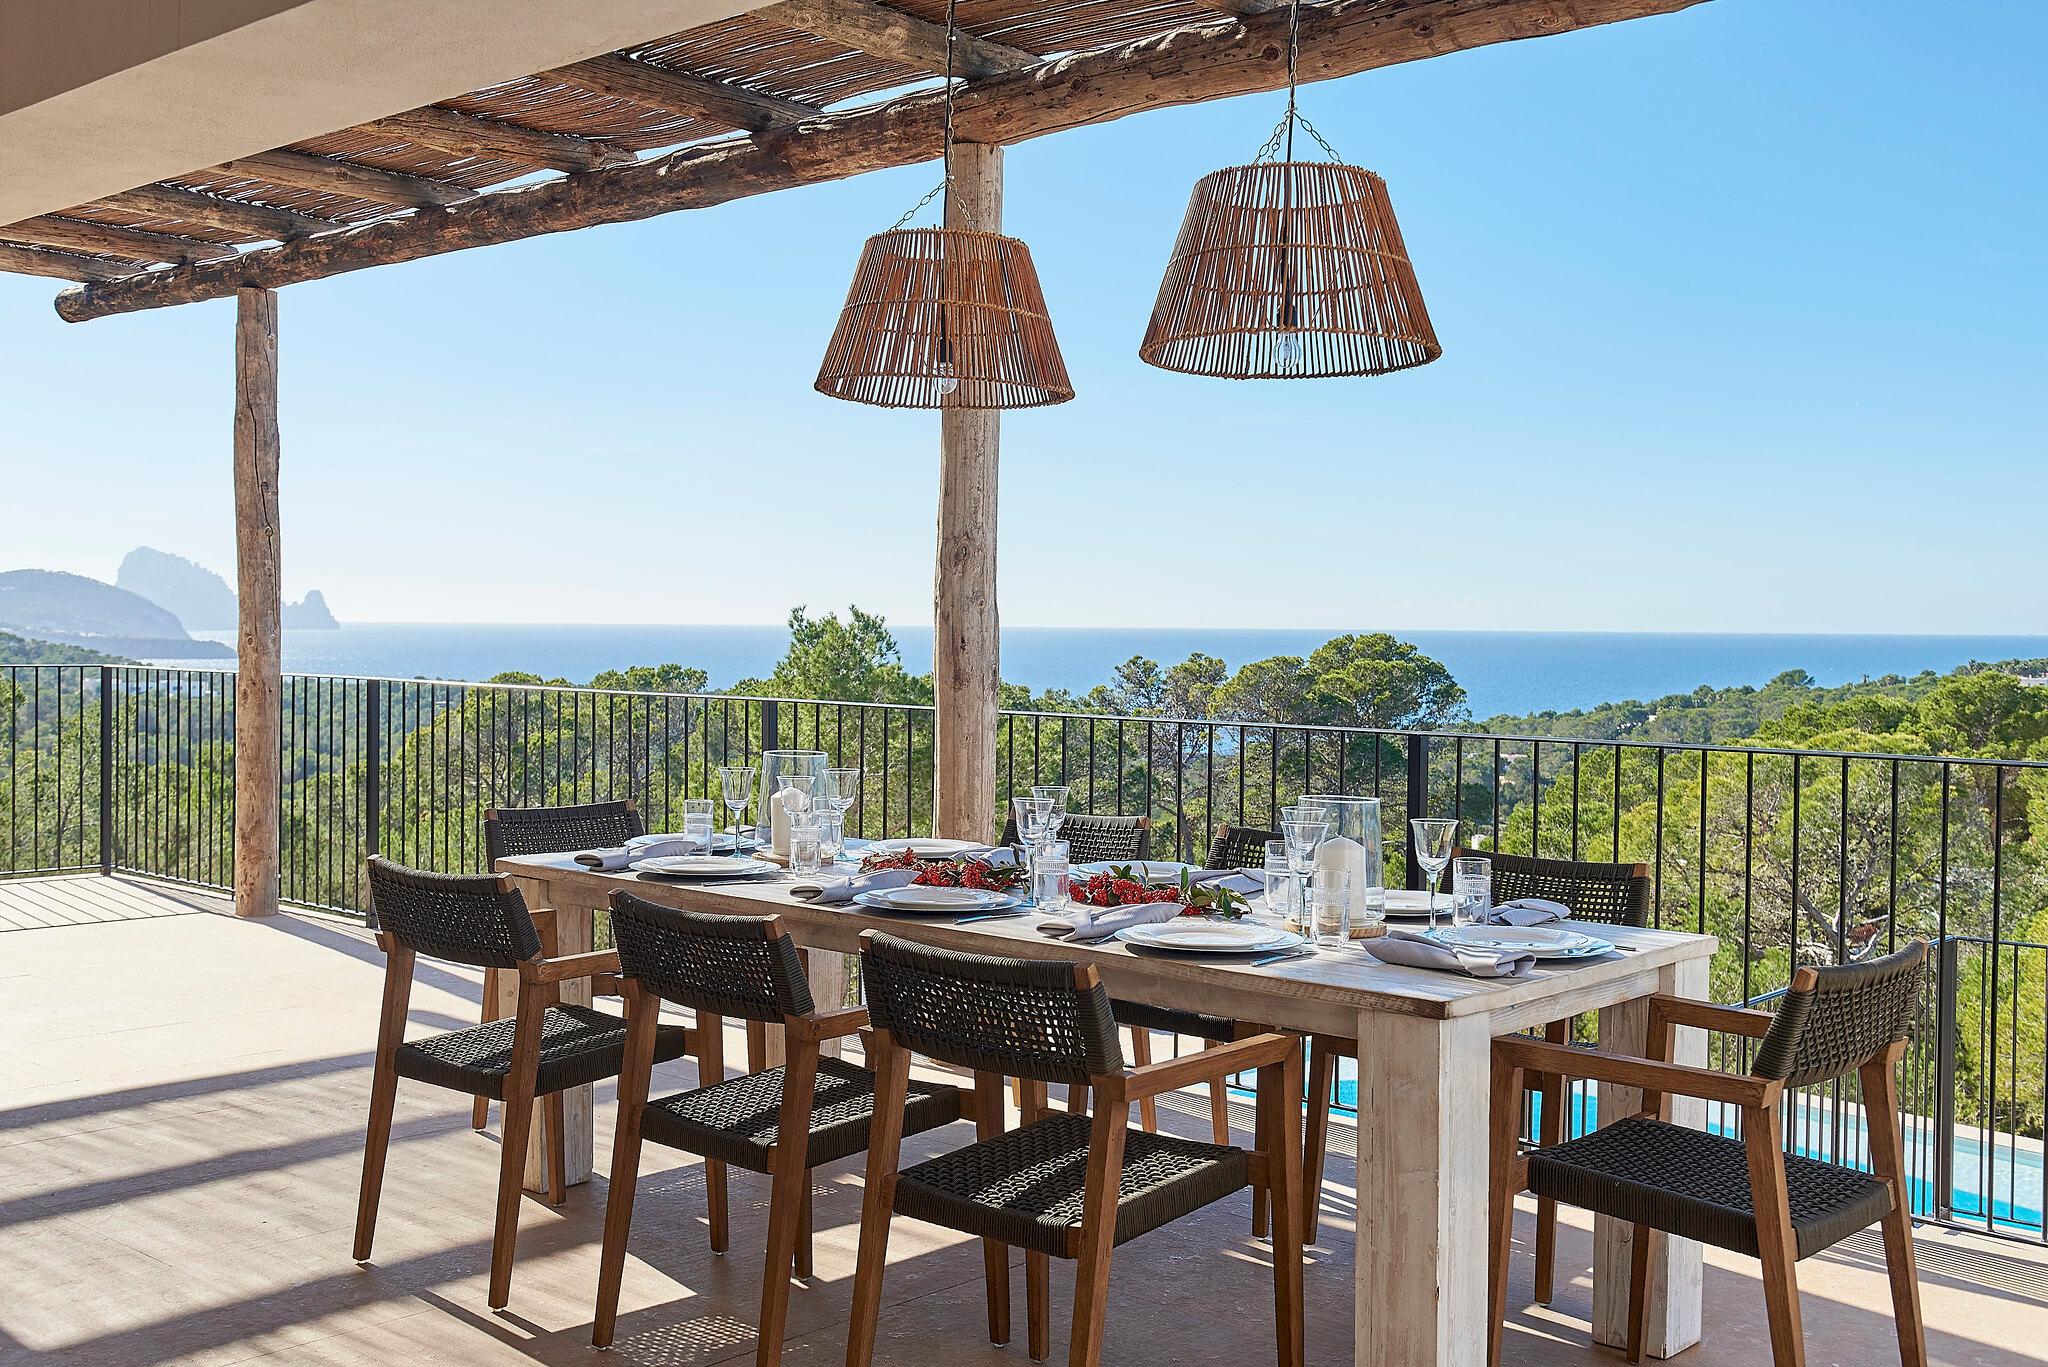 https://www.white-ibiza.com/wp-content/uploads/2020/06/white-ibiza-villas-sa-serra-exterior-terrace-views.jpg